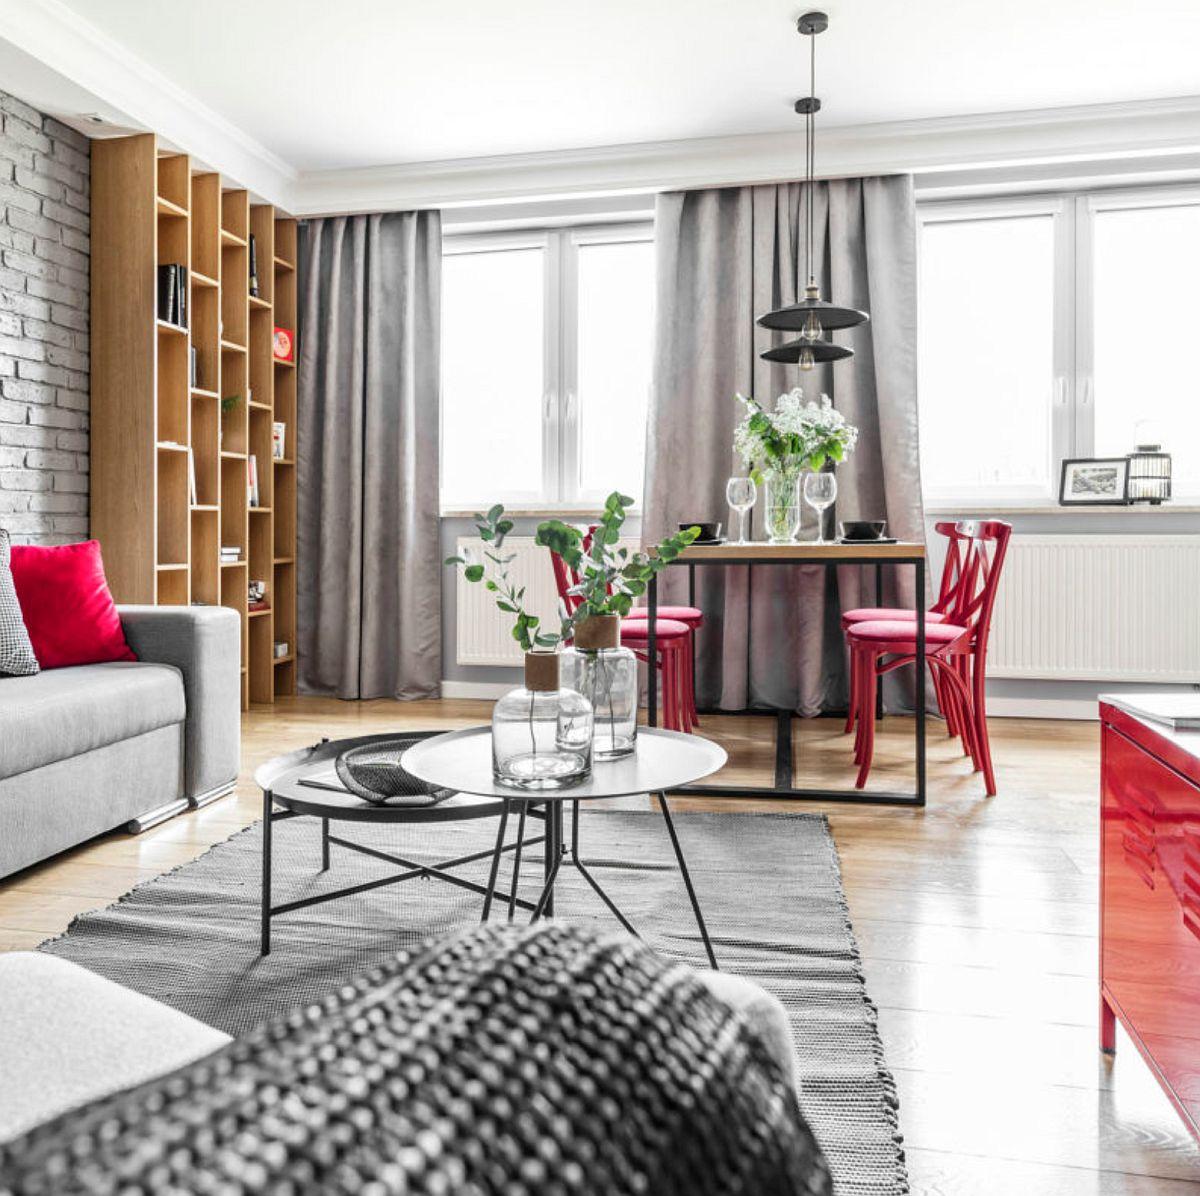 adelaparvu.com despre apartament 56 mp cu accente de rosu, design SAS Wnetrza i Kuchnie, Foto Strazynski Studio (10)